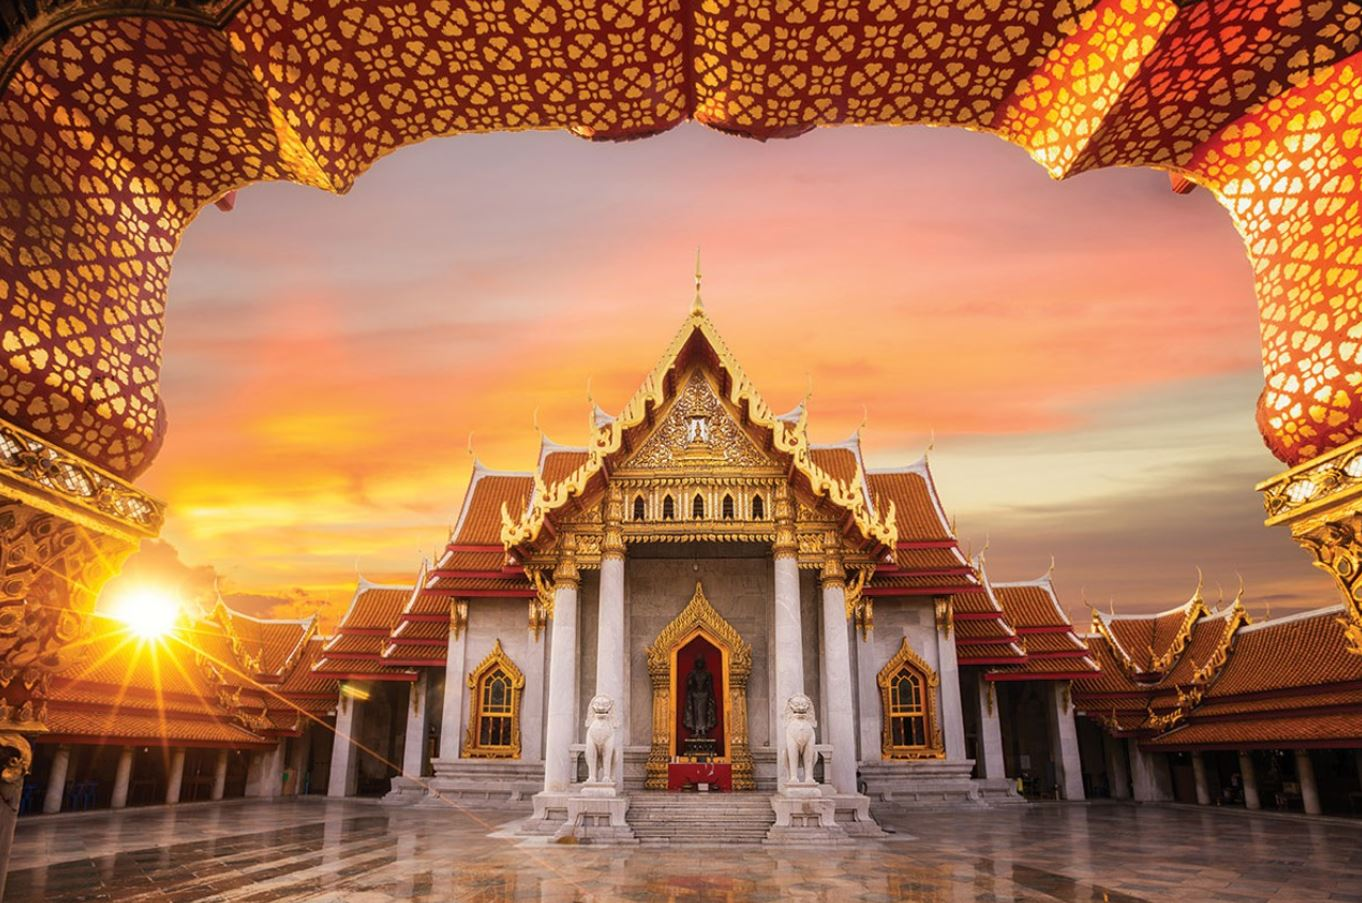 Photo of 3 Tempat Wisata Bangkok yang Wajib Kamu Kunjungi